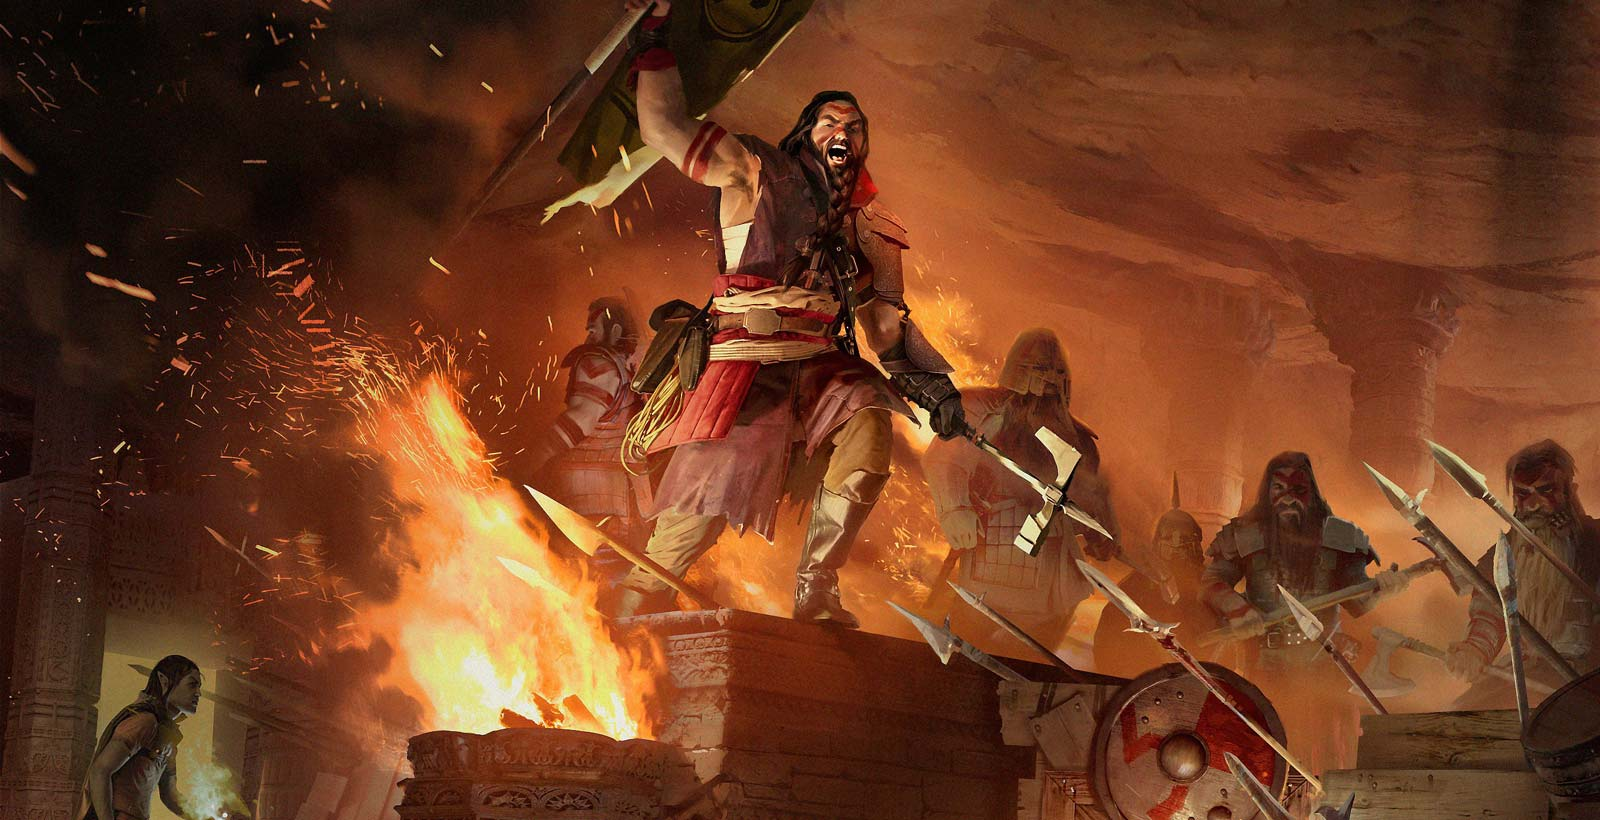 Image promotionnelle du jeu Ultima Ascendant.